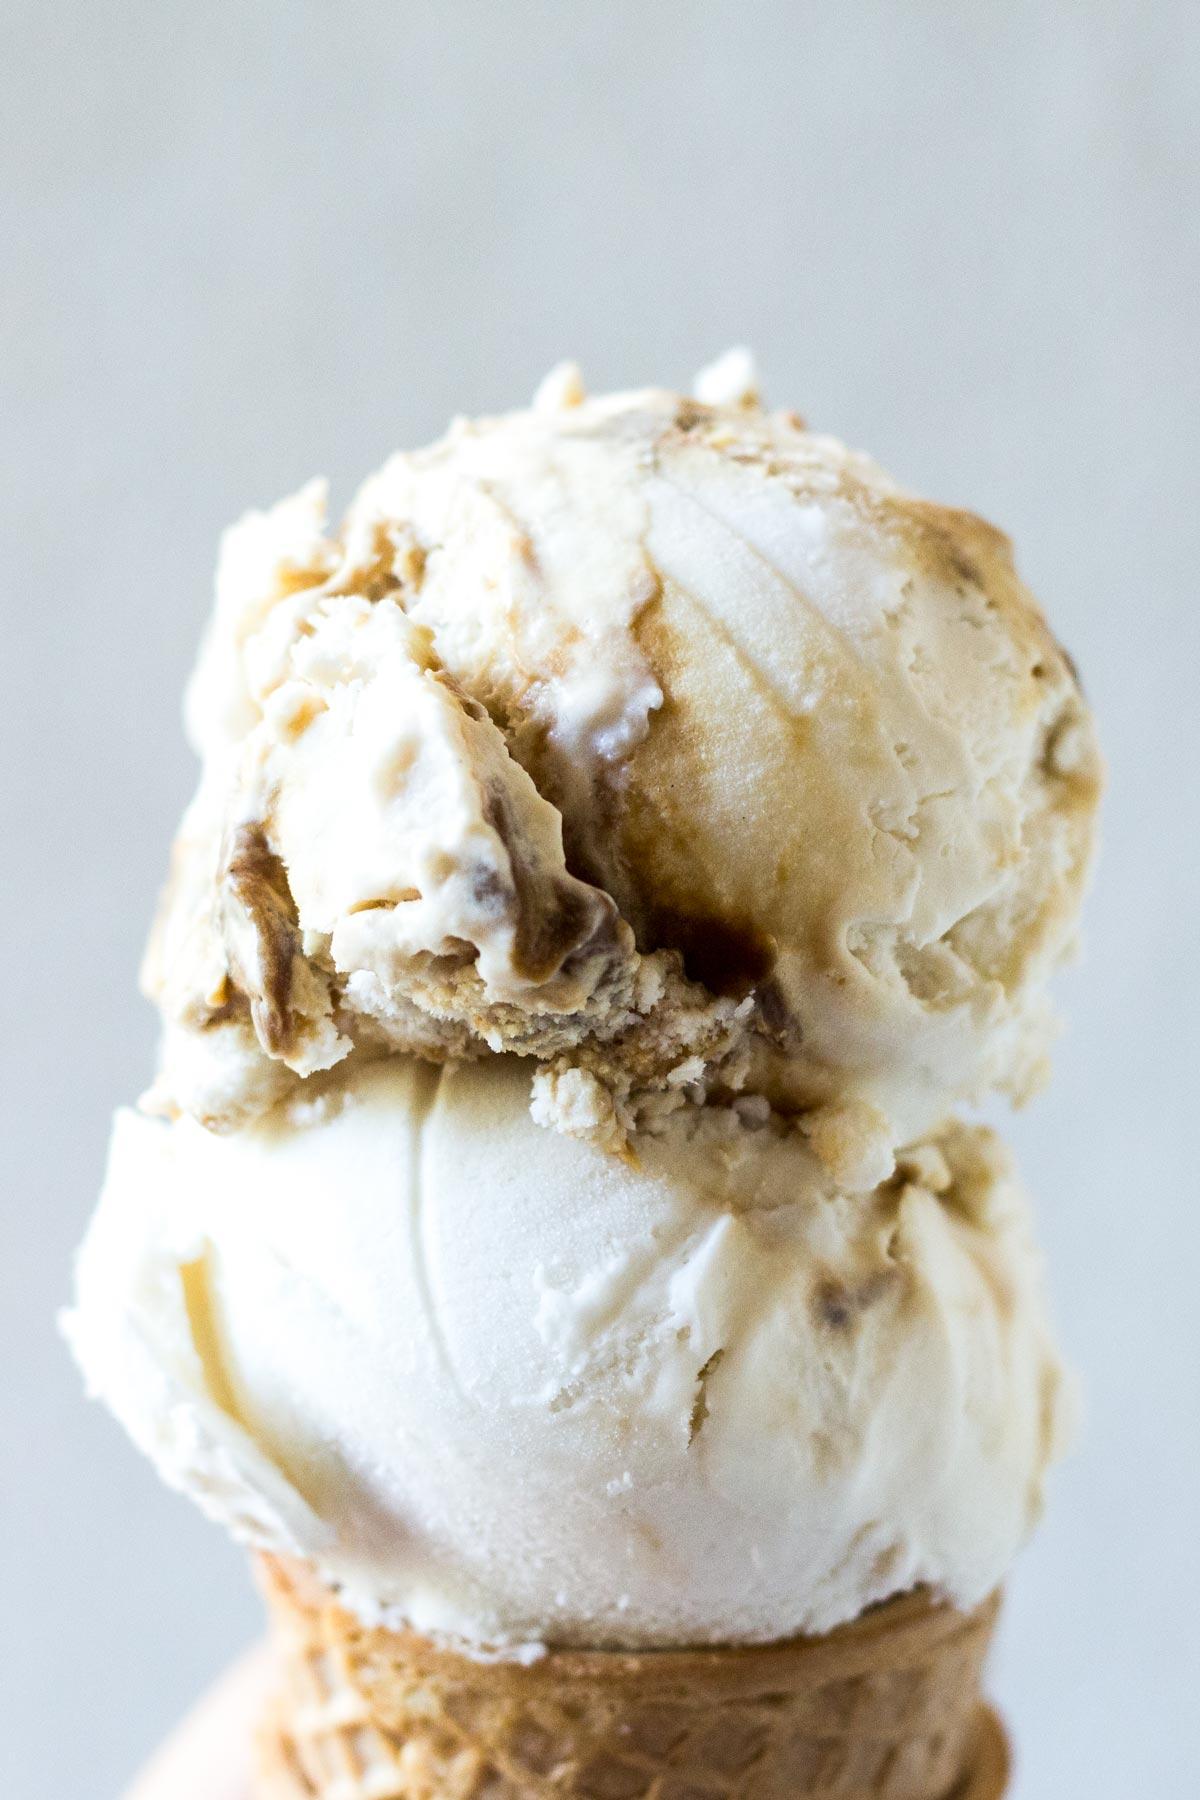 Salted Caramel Vegan Ice Cream